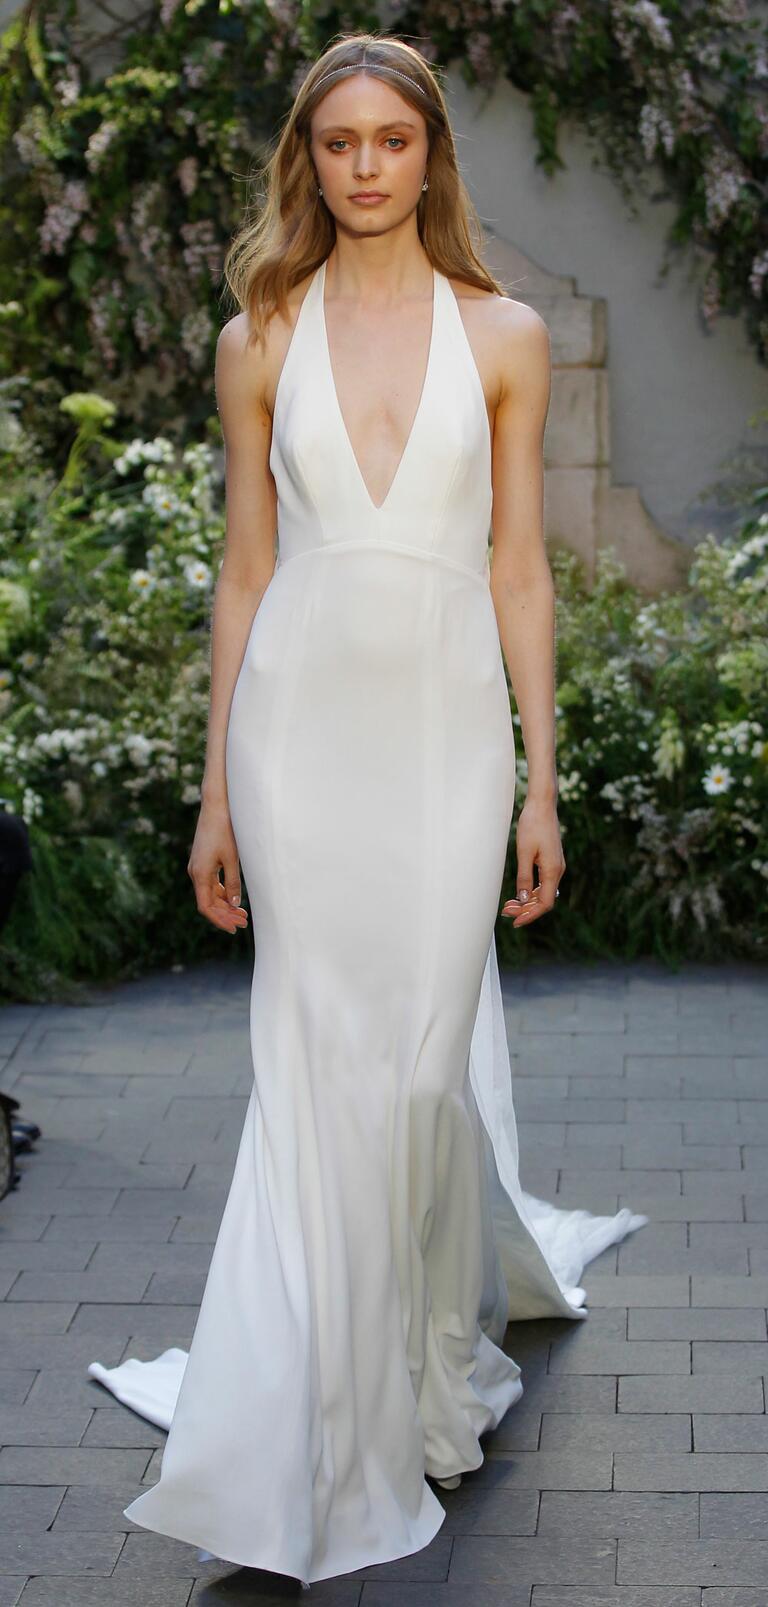 monique lhuillier bridal fashion week spring plunge wedding dress Monique Lhuillier Spring silk white crepe wedding dress with plunging V neck halter